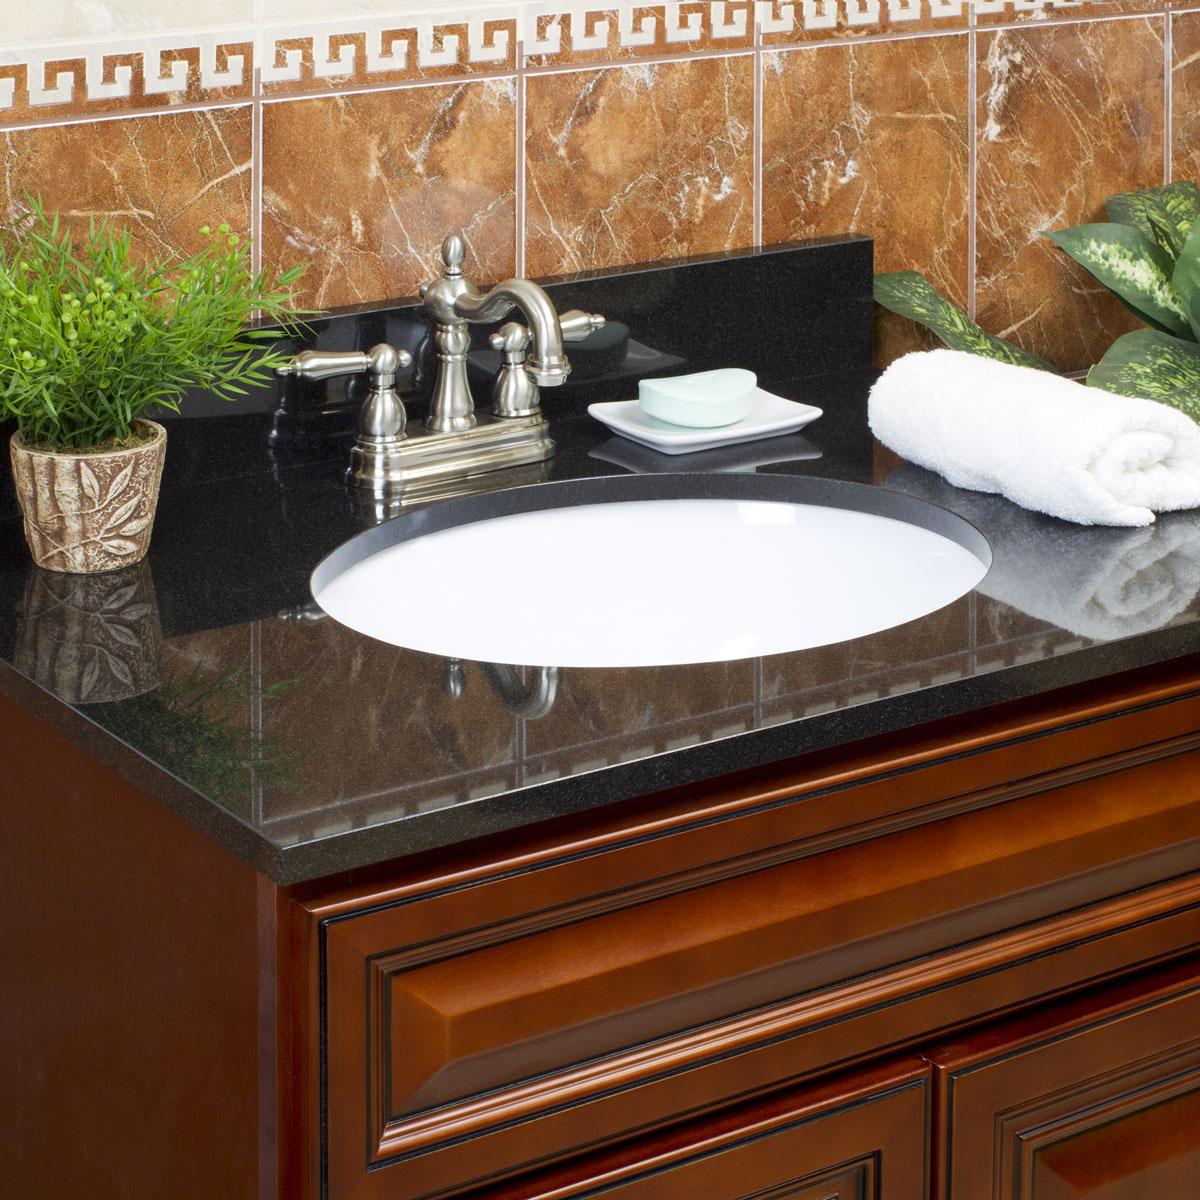 48 kitchen sink base cabinet new york loft design lesscare newport quot bathroom maple vanity